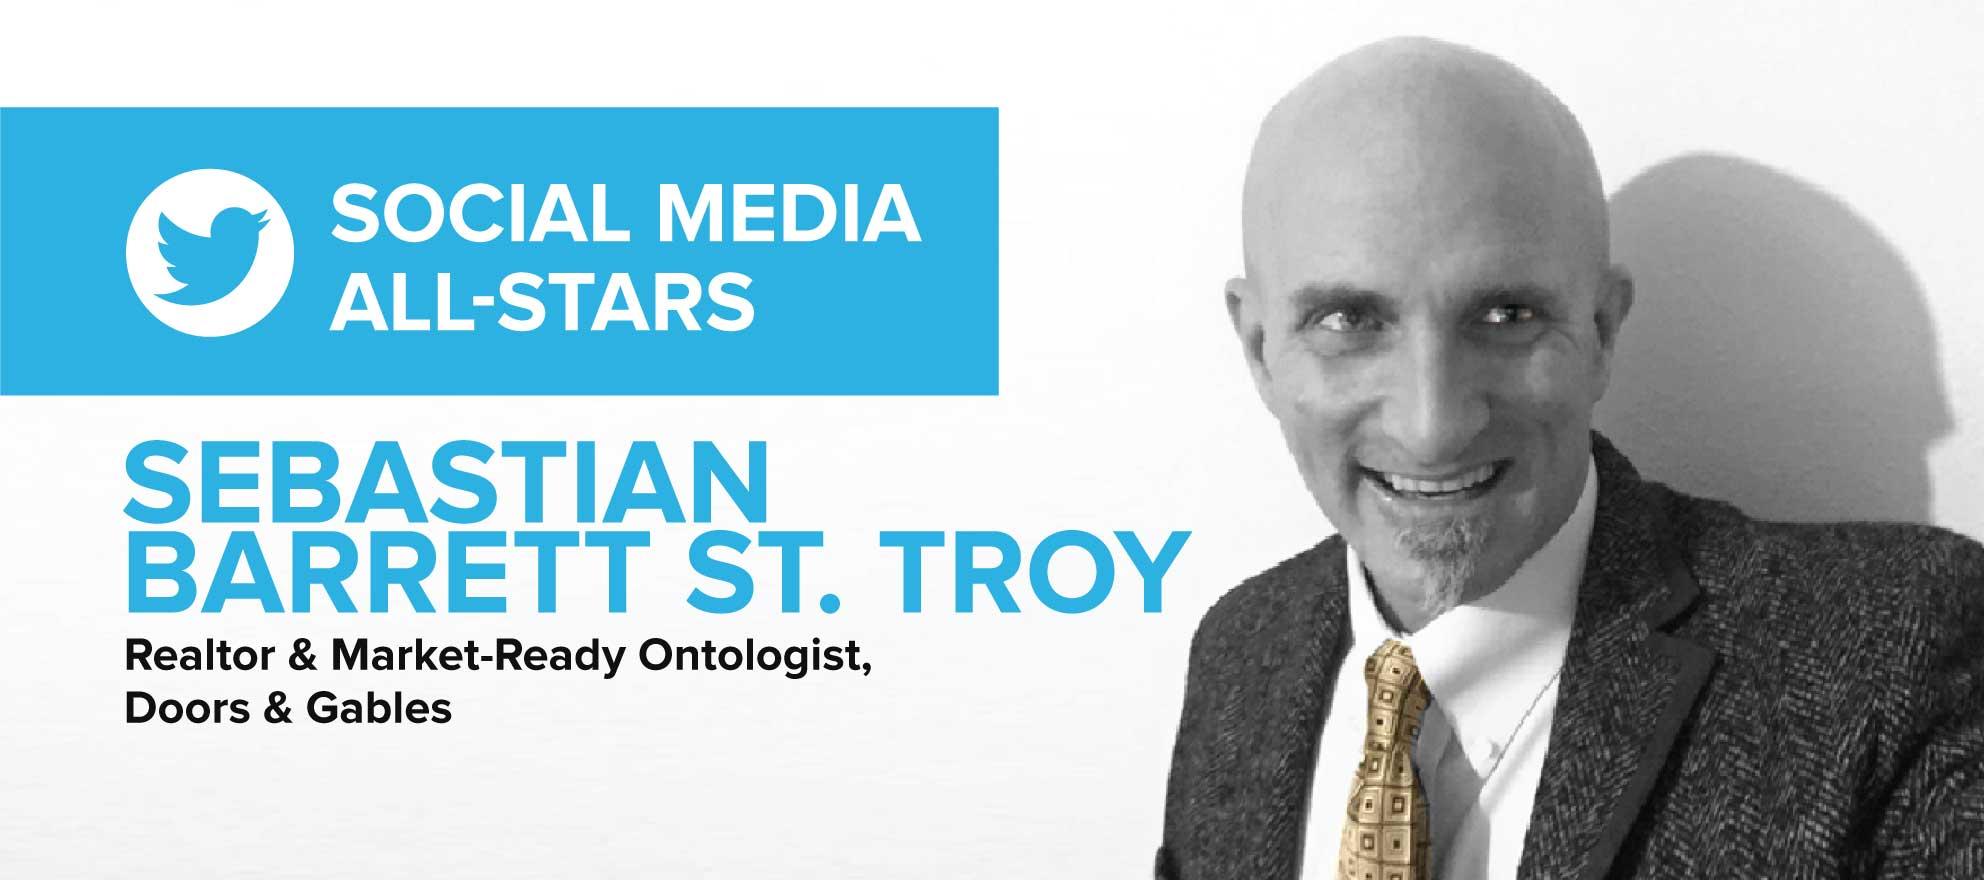 Sebastian Barrett St. Troy on how smaller companies lack direction on social media